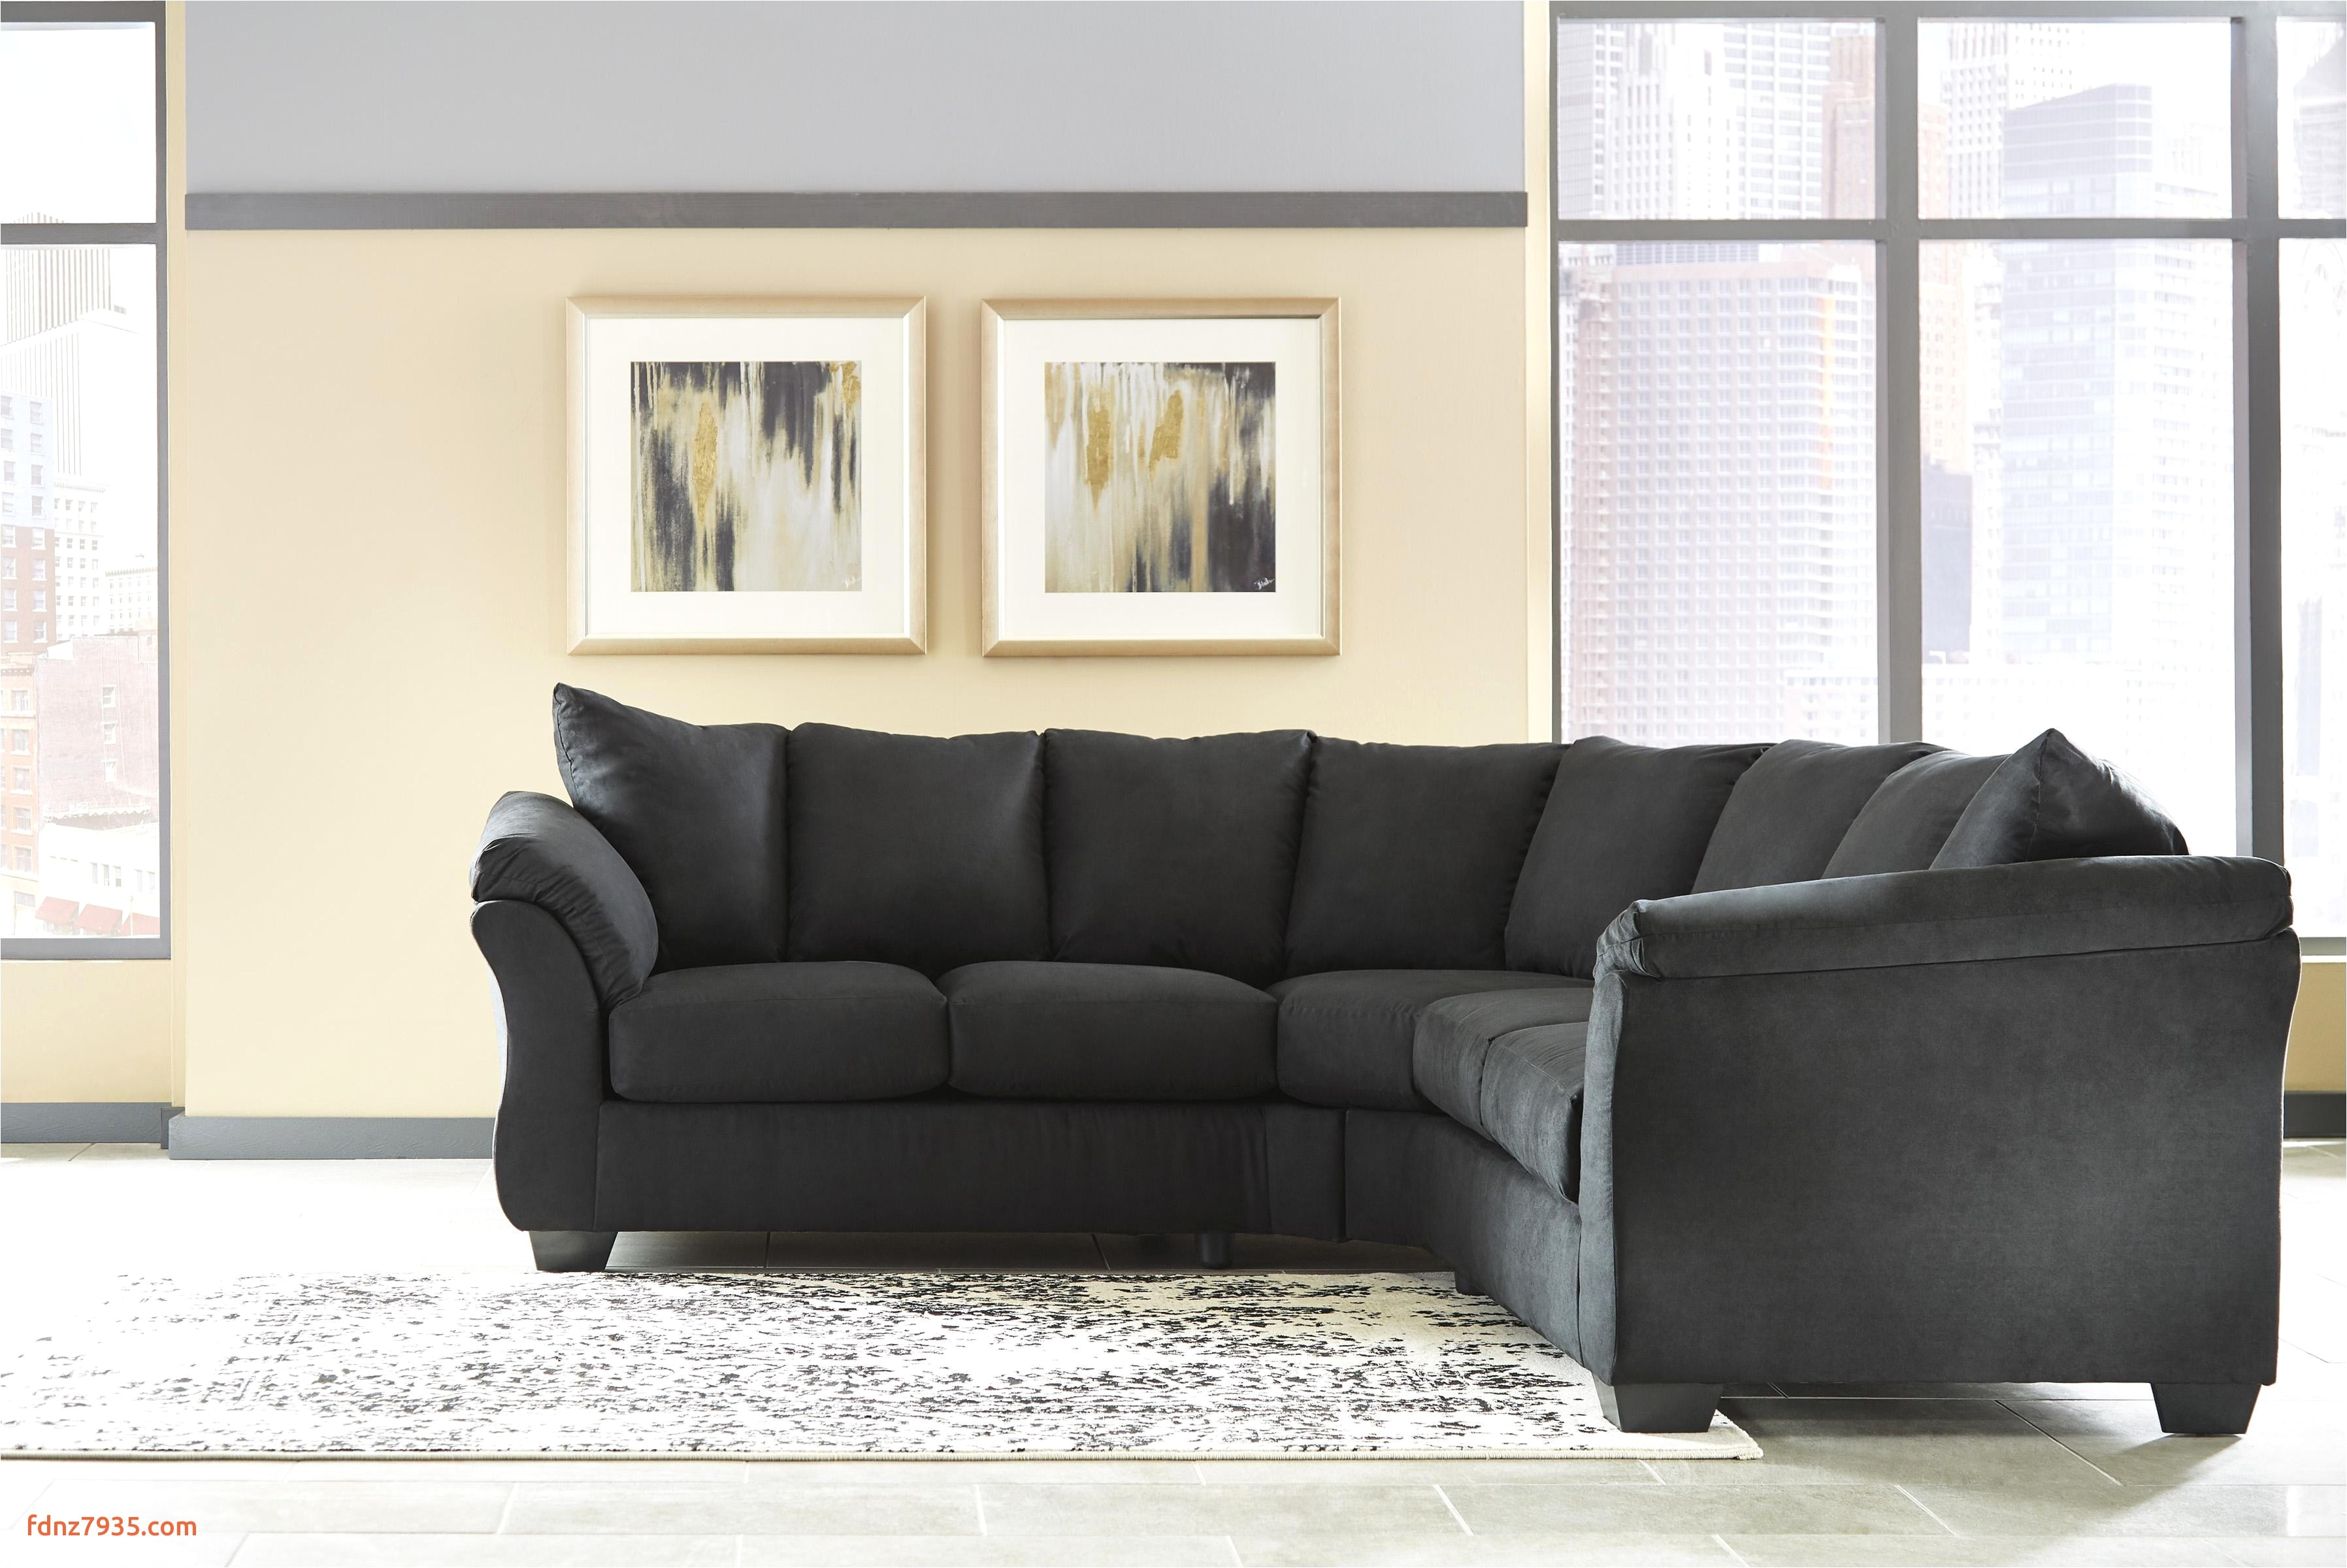 Fold Out Sleeper Chair Ikea Sleeper sofa Pull Out Fresh sofa Design